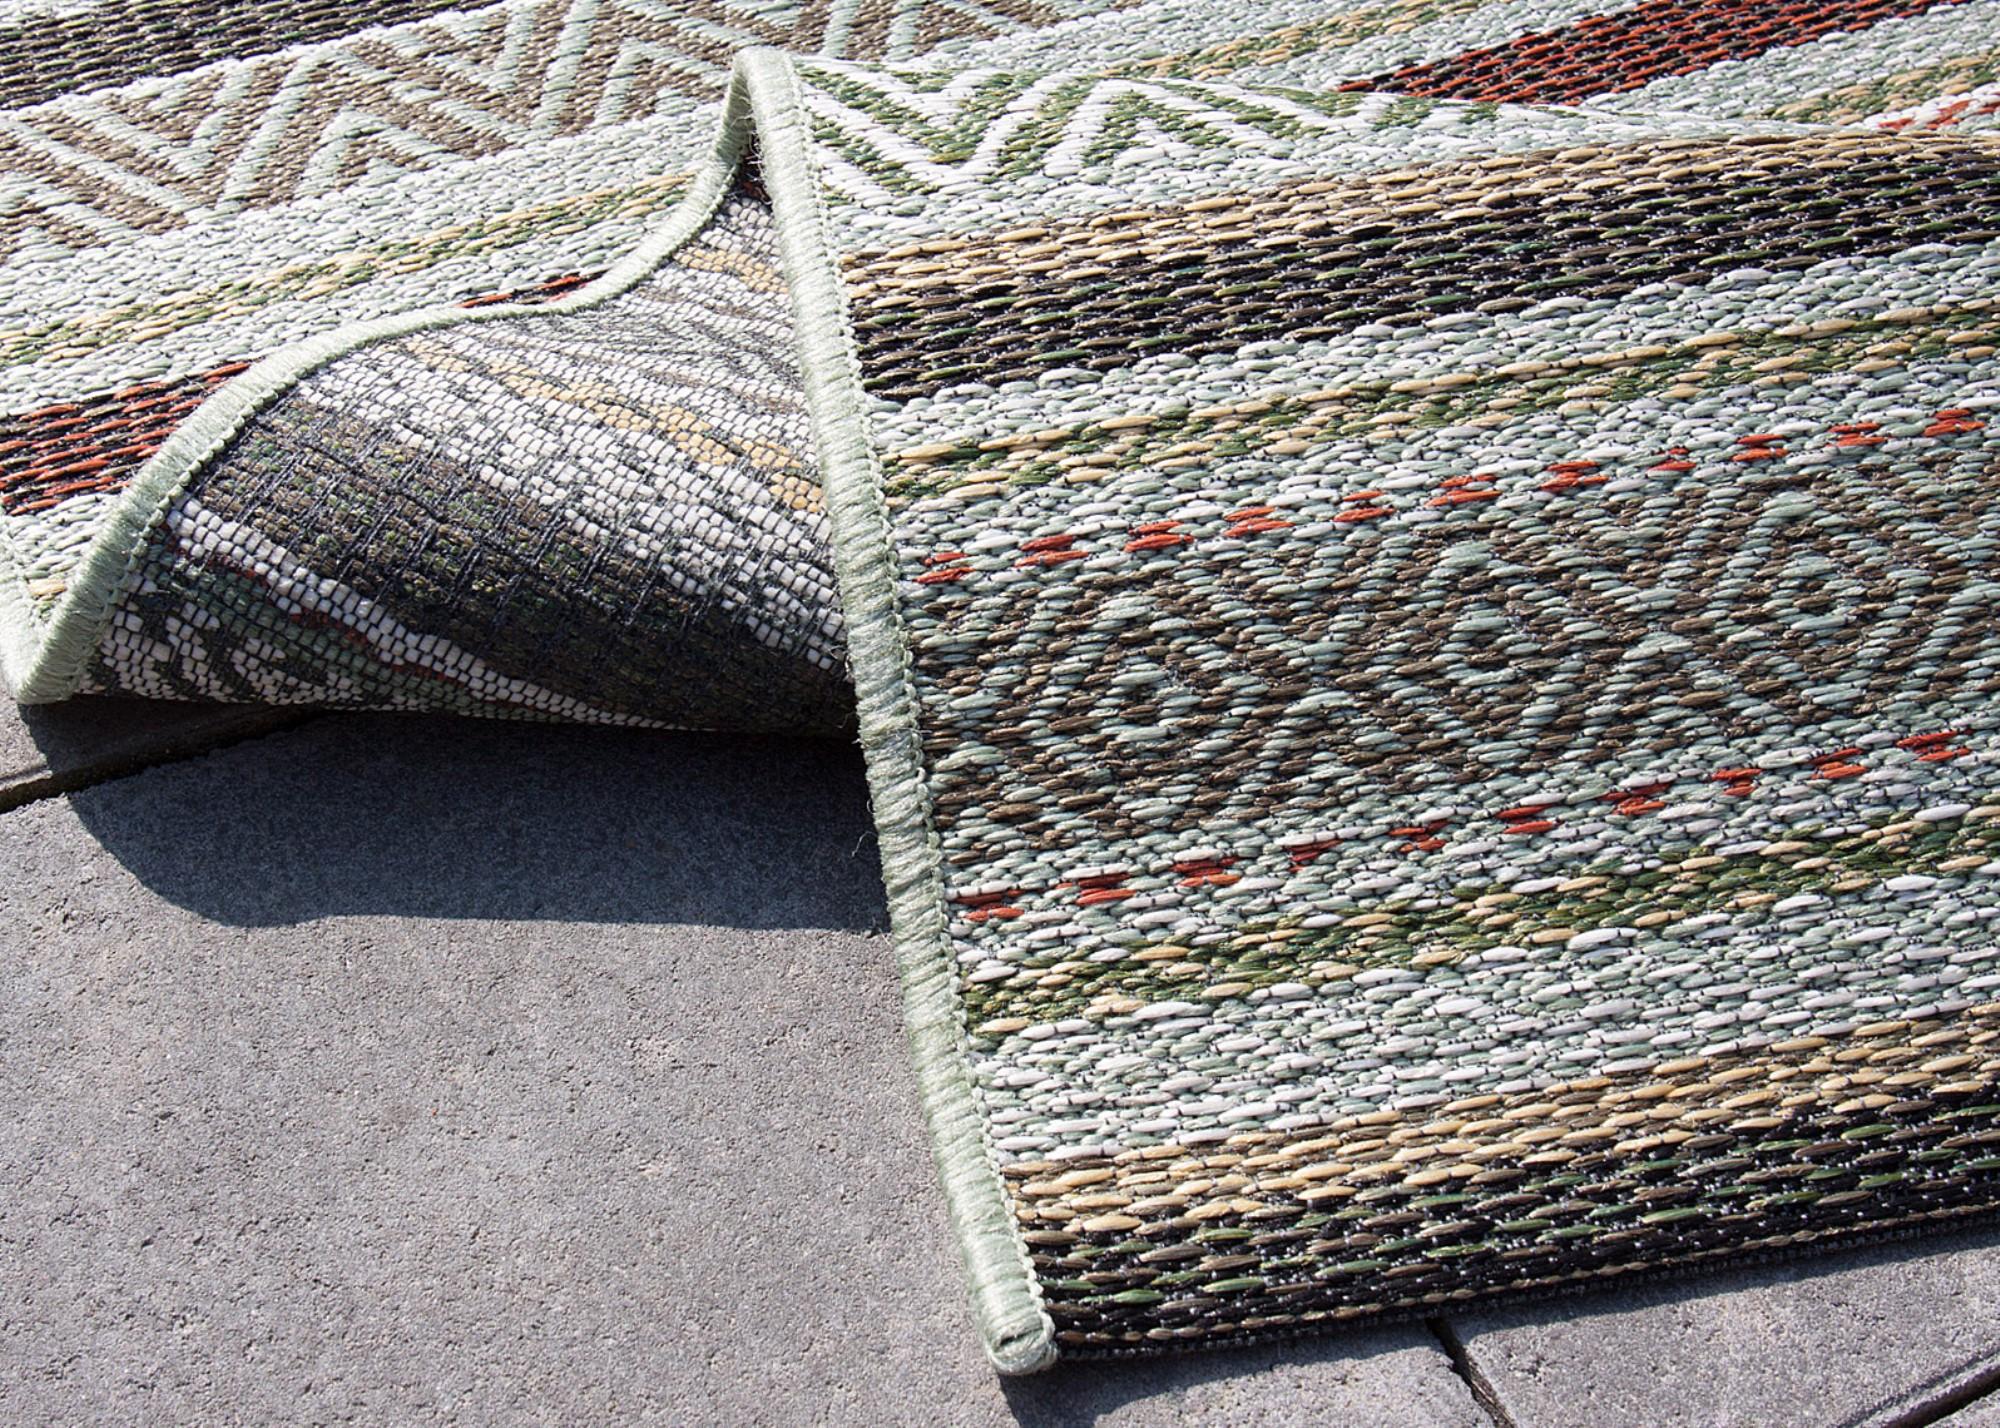 in outdoor teppich varberg beige blau grau gr n t rkis. Black Bedroom Furniture Sets. Home Design Ideas